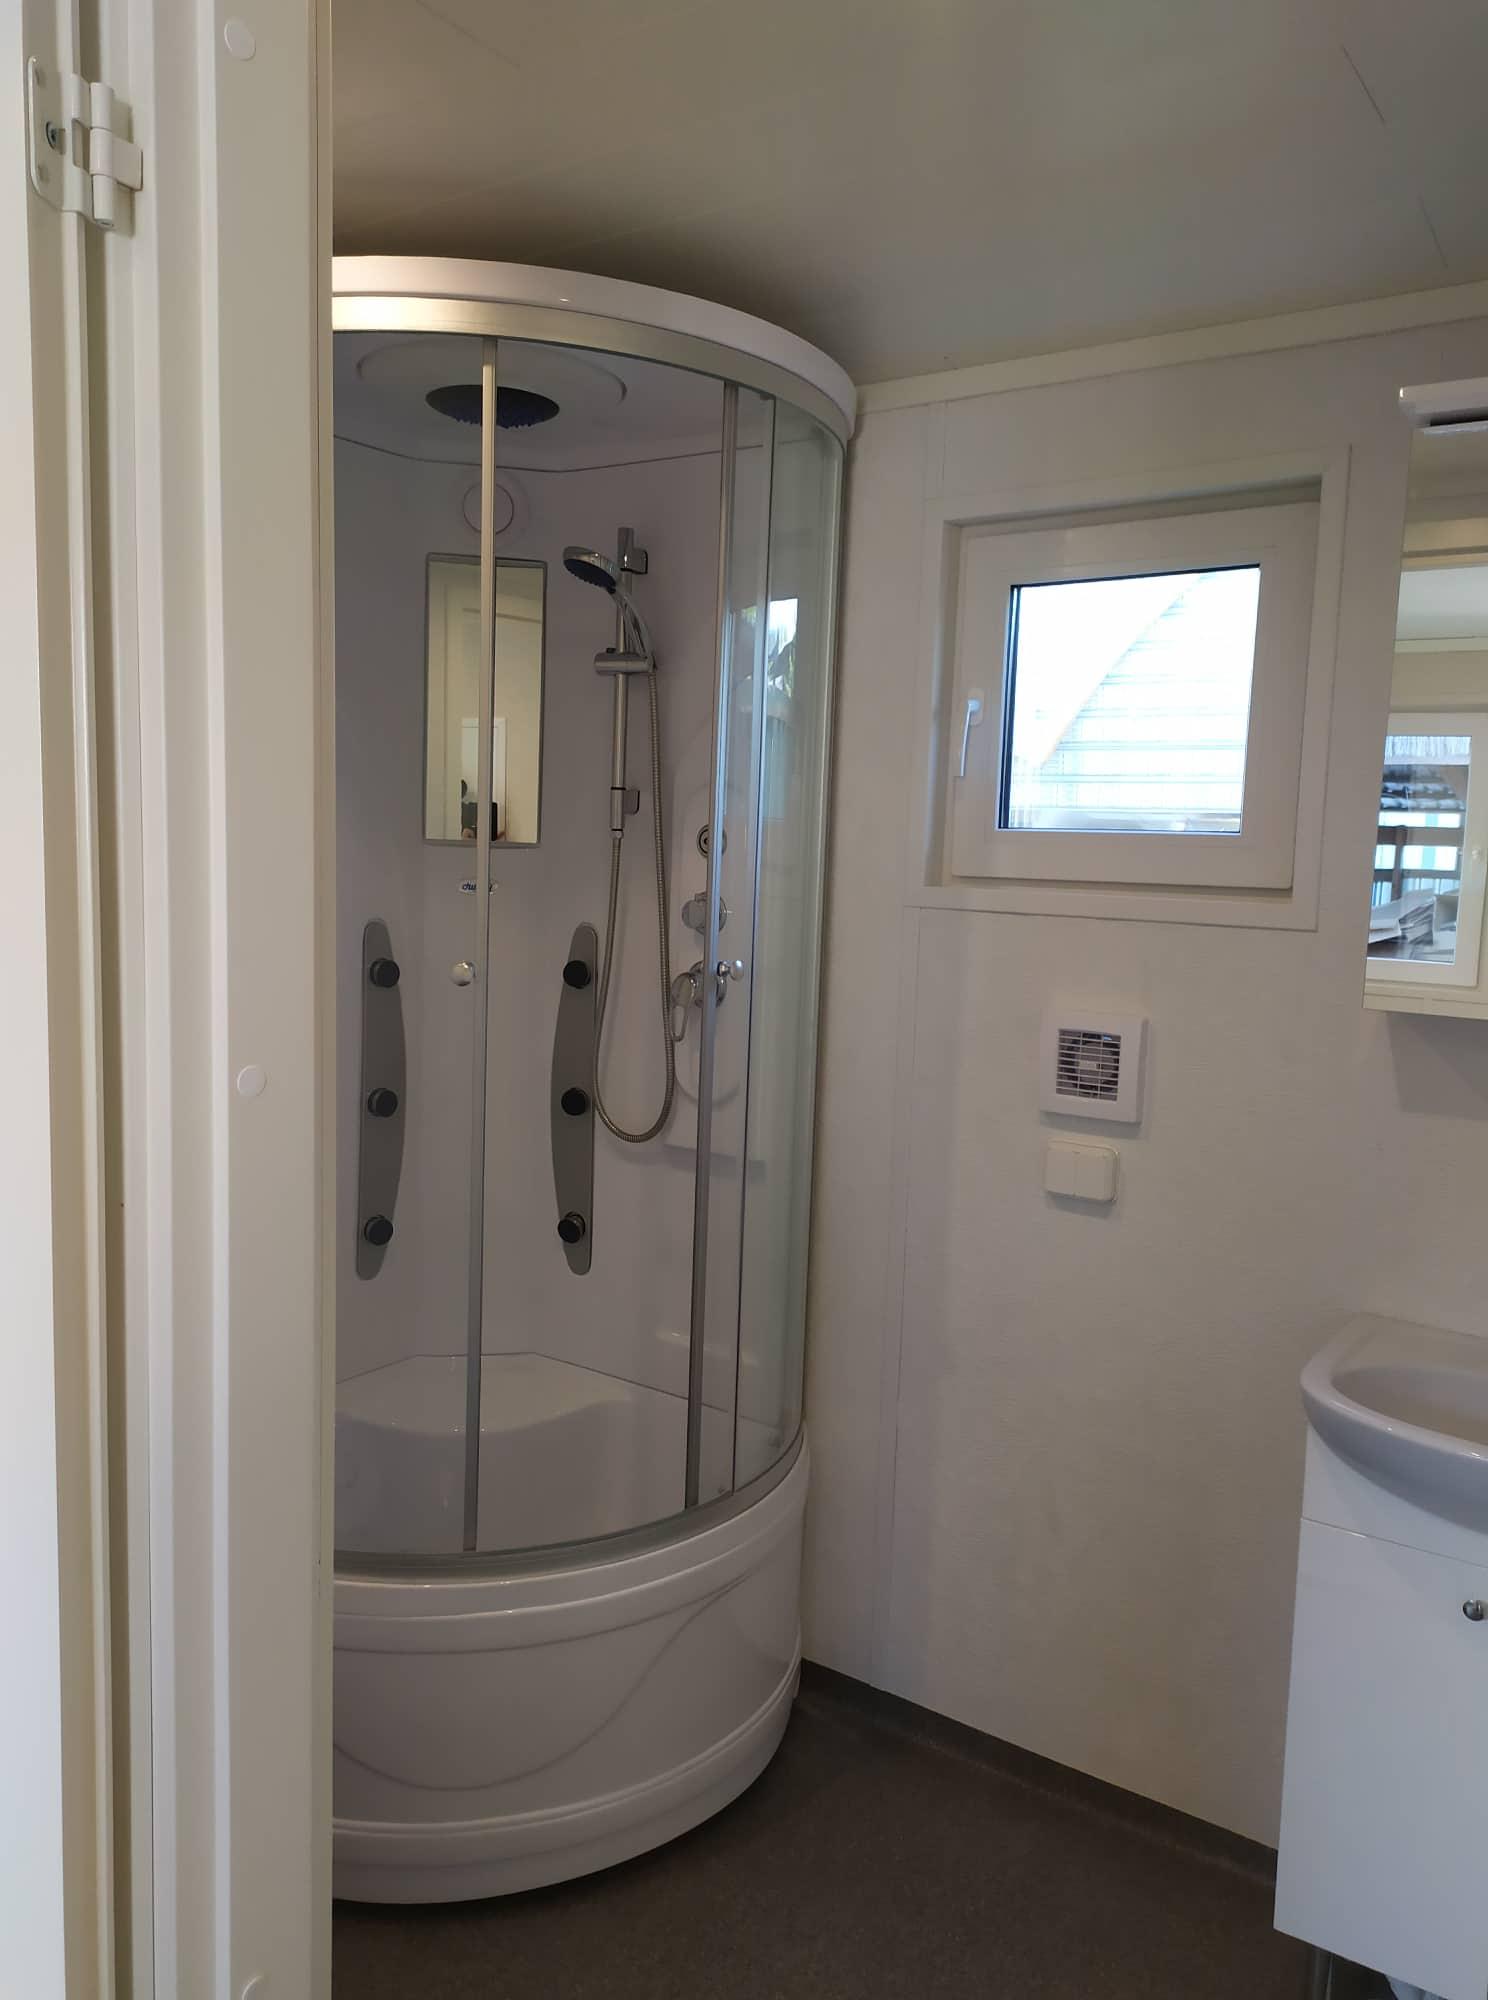 Talovaunu-kylpyhuone-ratastelkodu-talotehdas.jpg